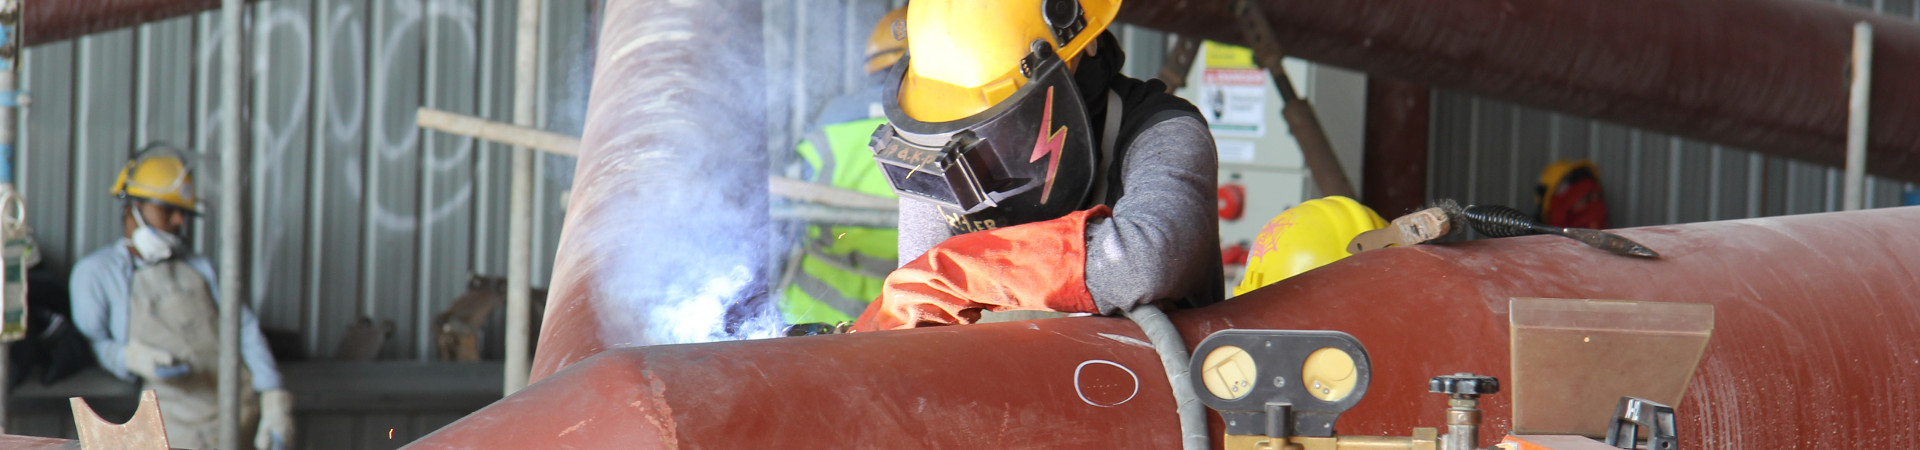 Wasting welders craftsmanship_banner3-1920x450